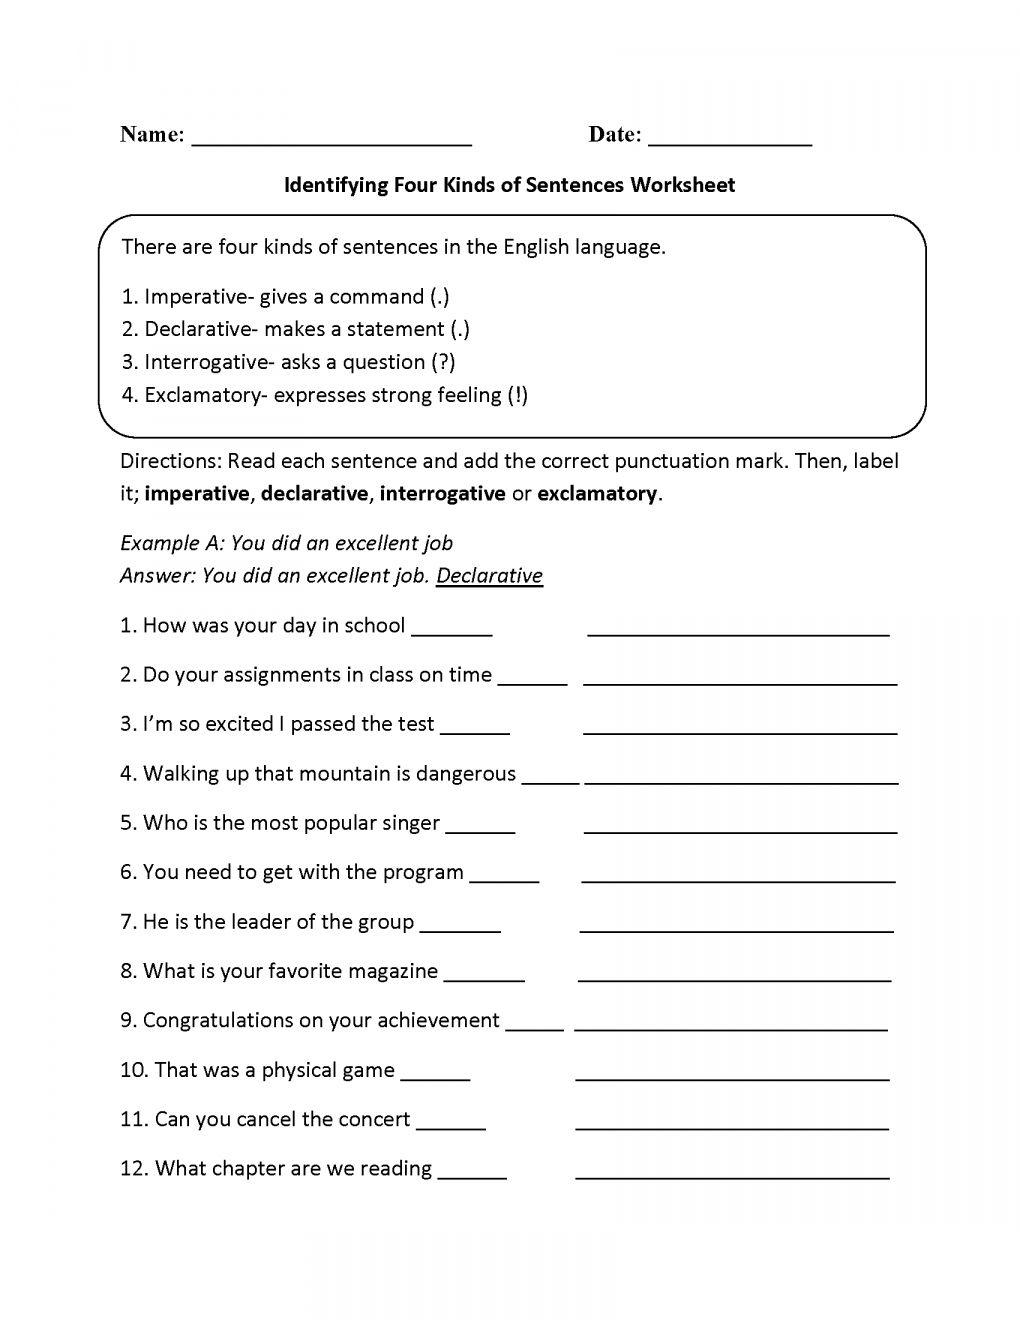 Grammar Worksheets 5th Grade Pdf 5 Free Grammar Worksheets Fifth Grade 5 Adjectives Adverbs In 2020 Writing Homework Editing Checklist Third Grade Writing